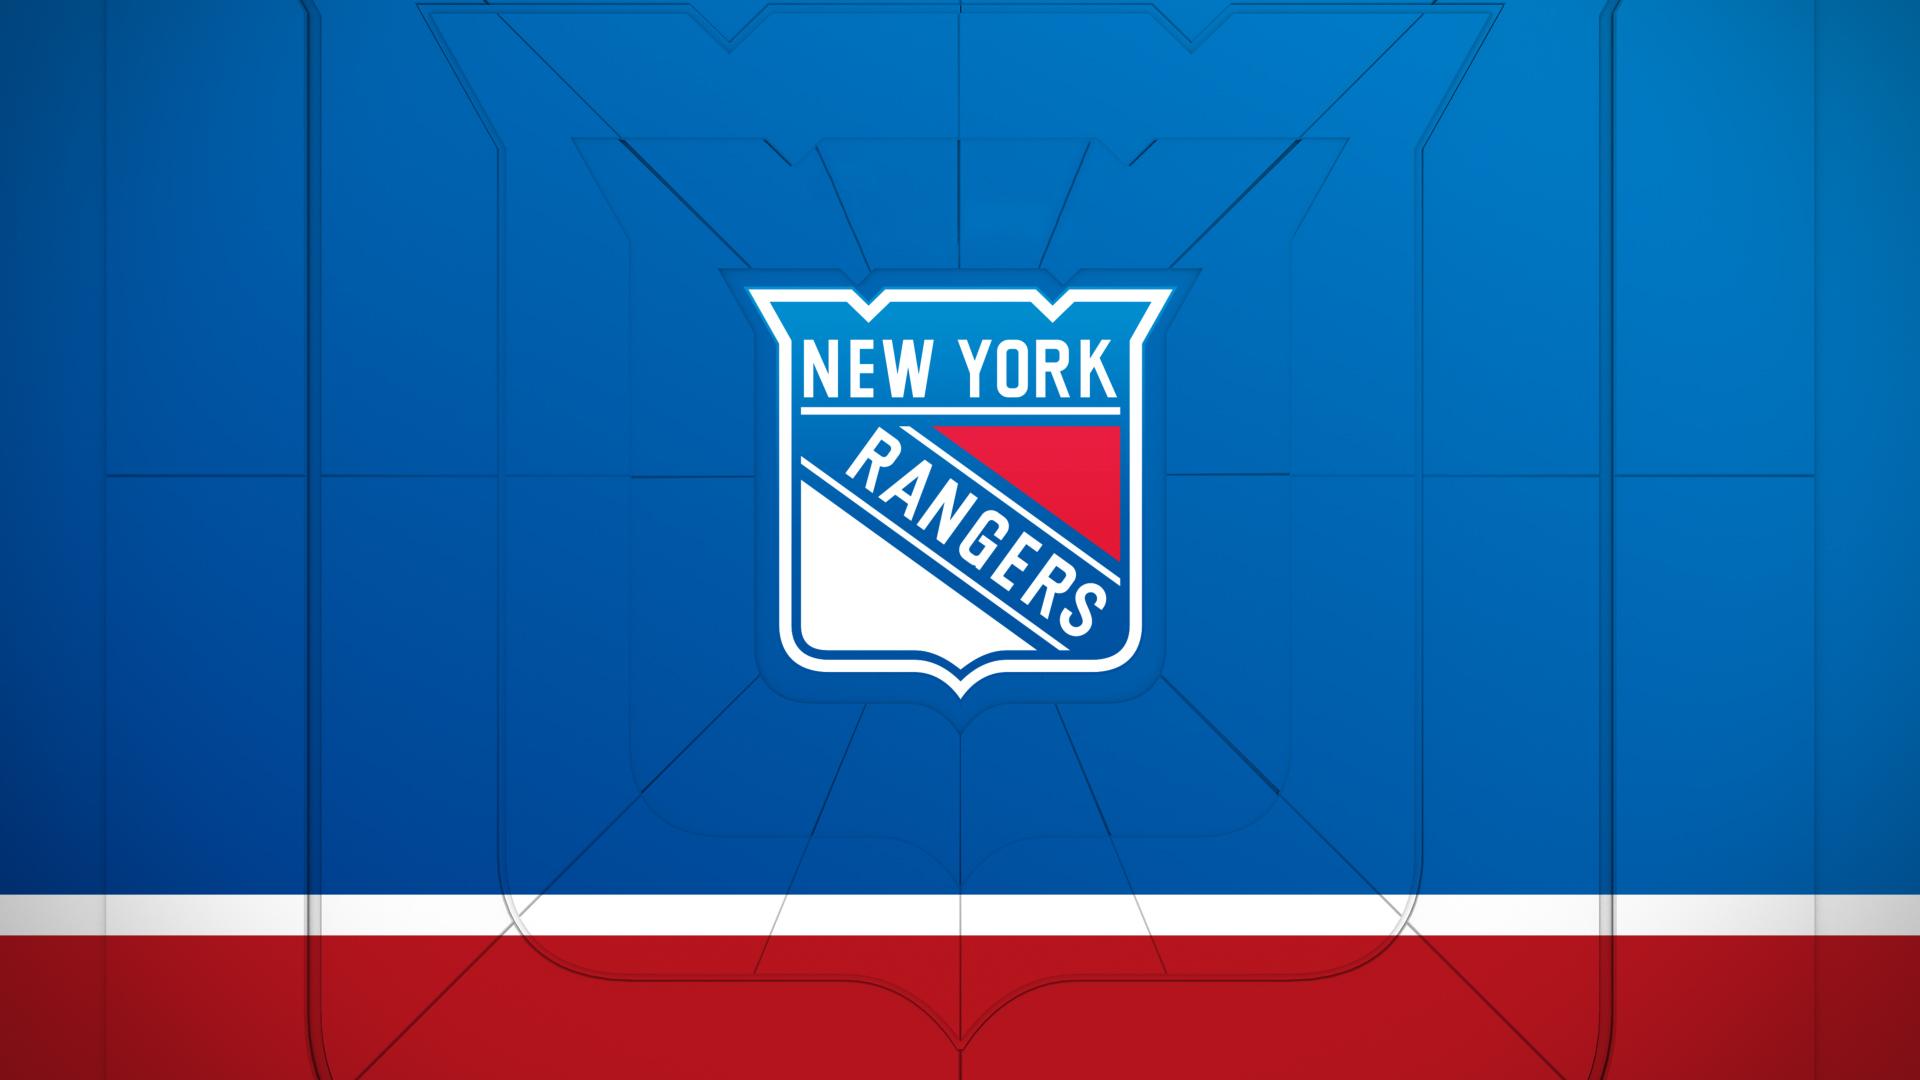 New York Knicks - Google Nhl New York Islanders And Rangers , HD Wallpaper & Backgrounds